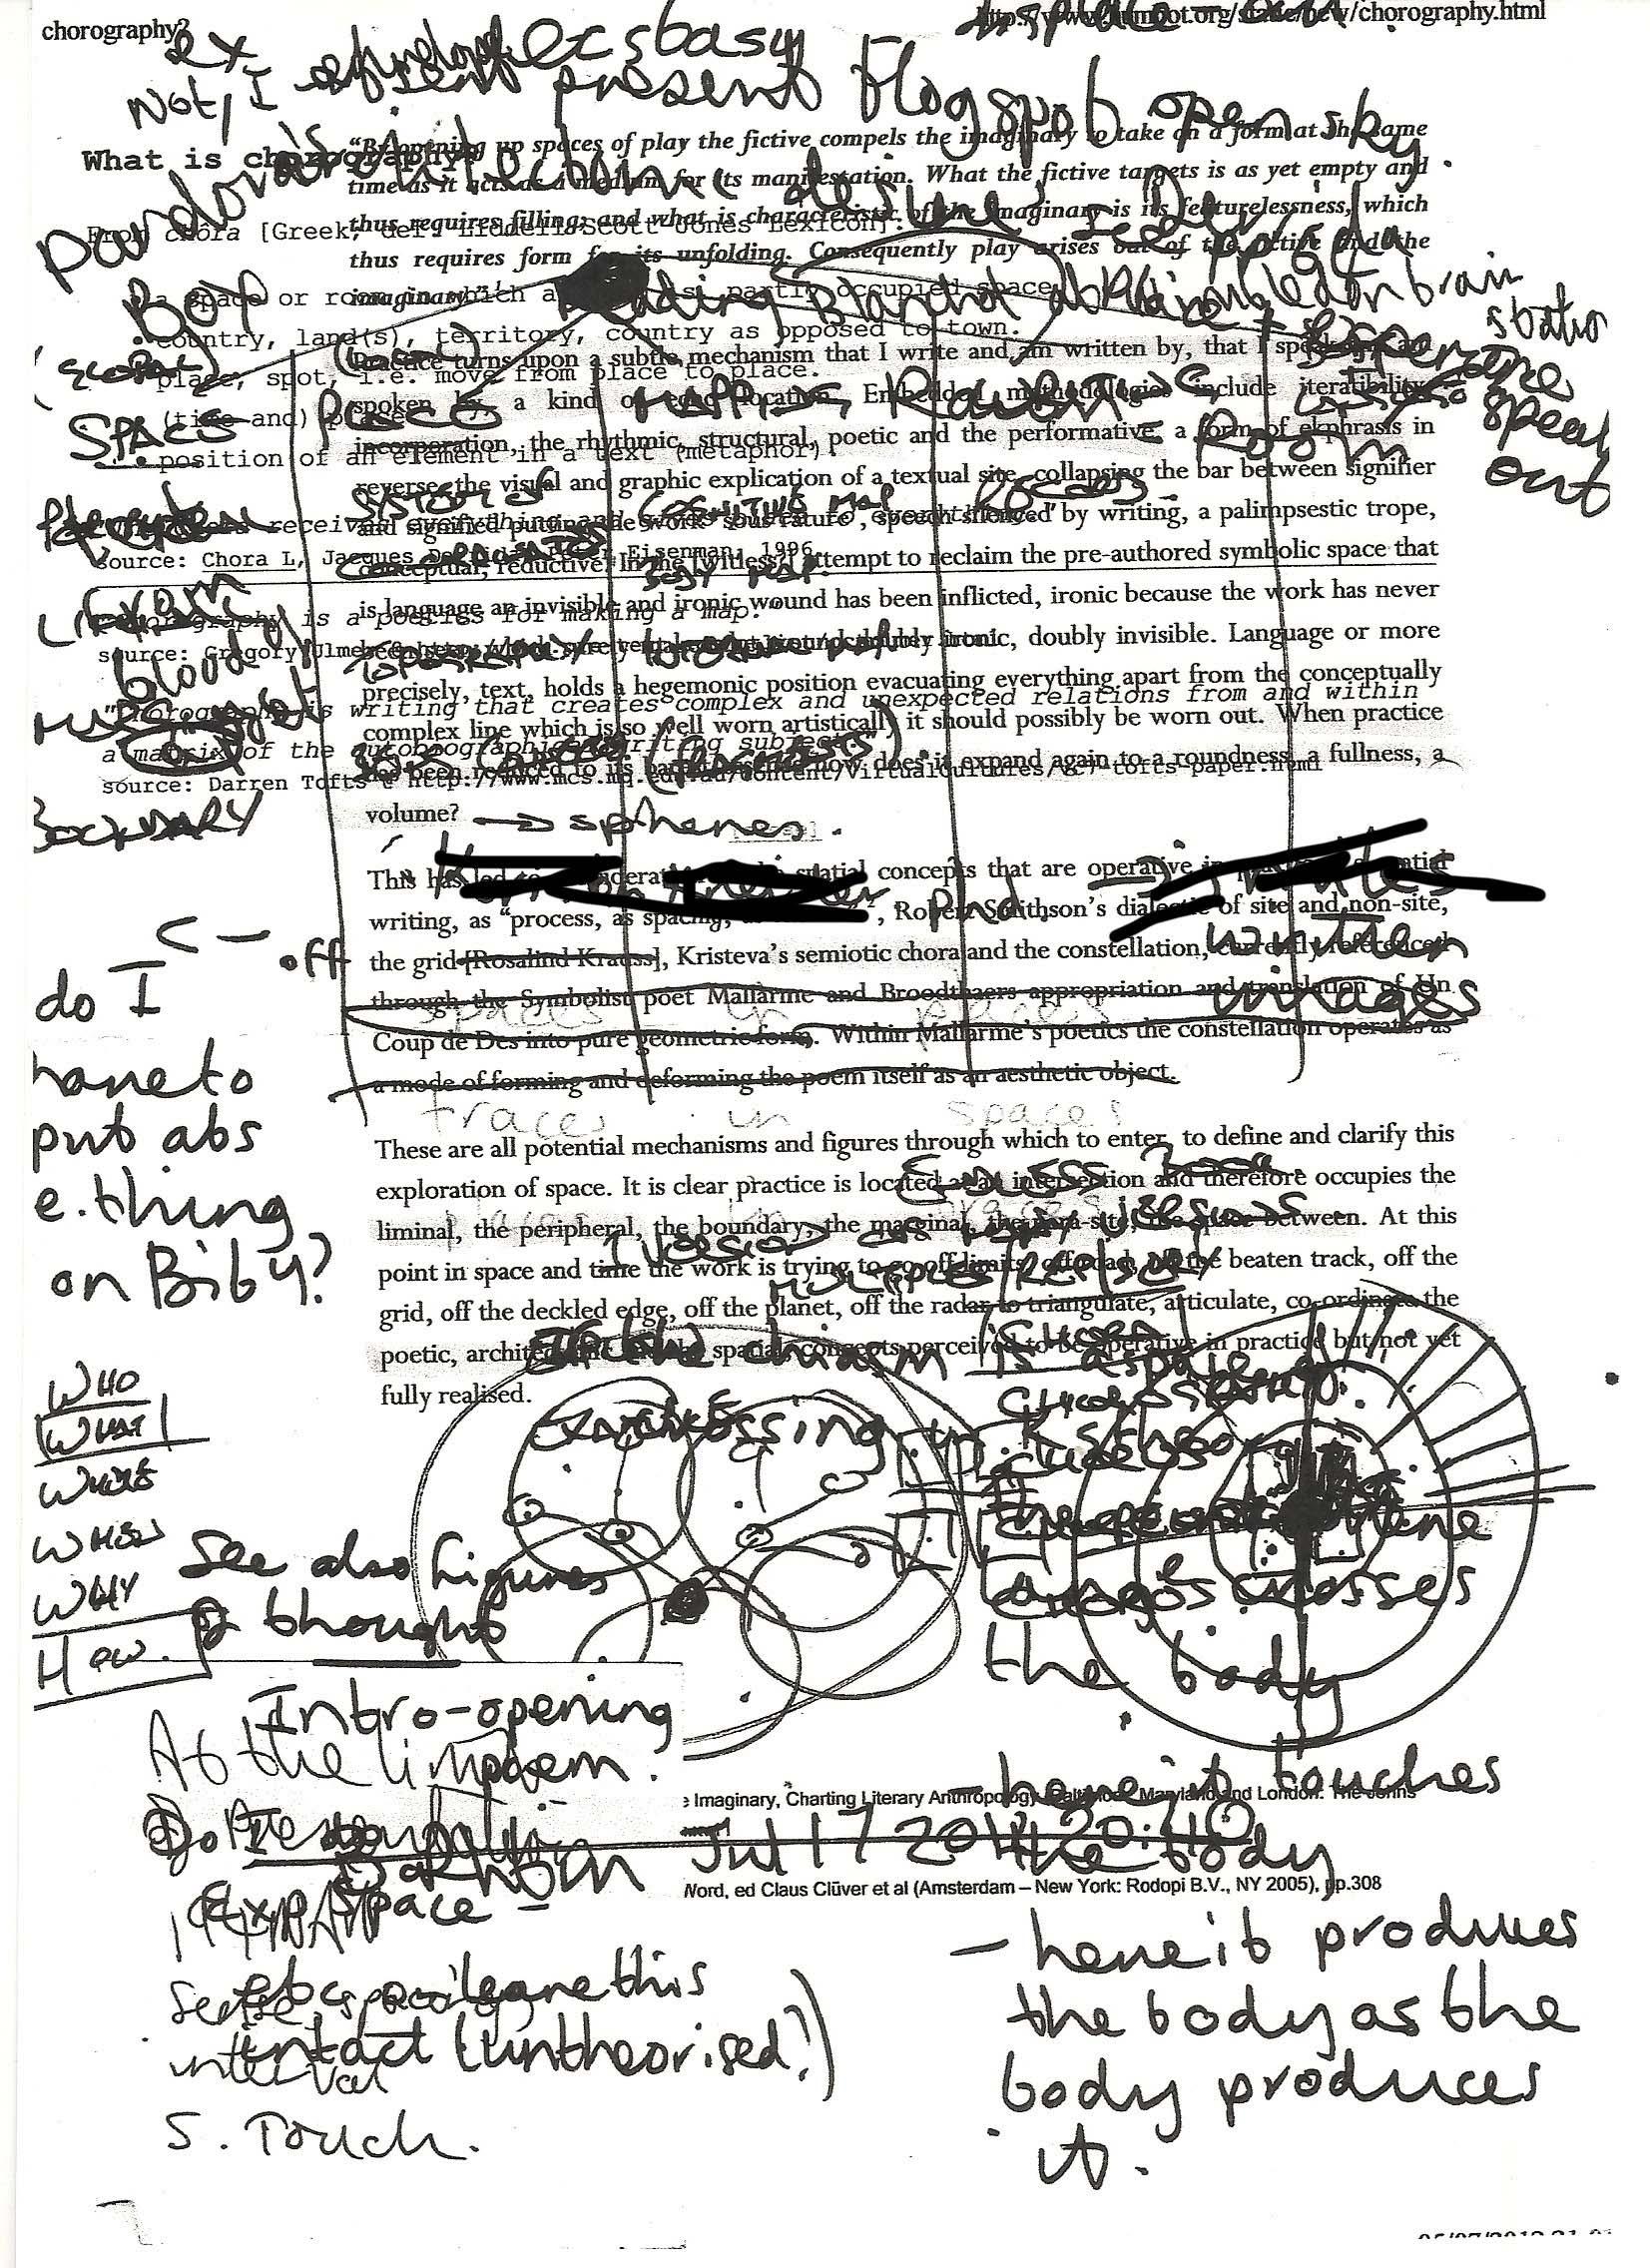 Apa style essay paper princeton